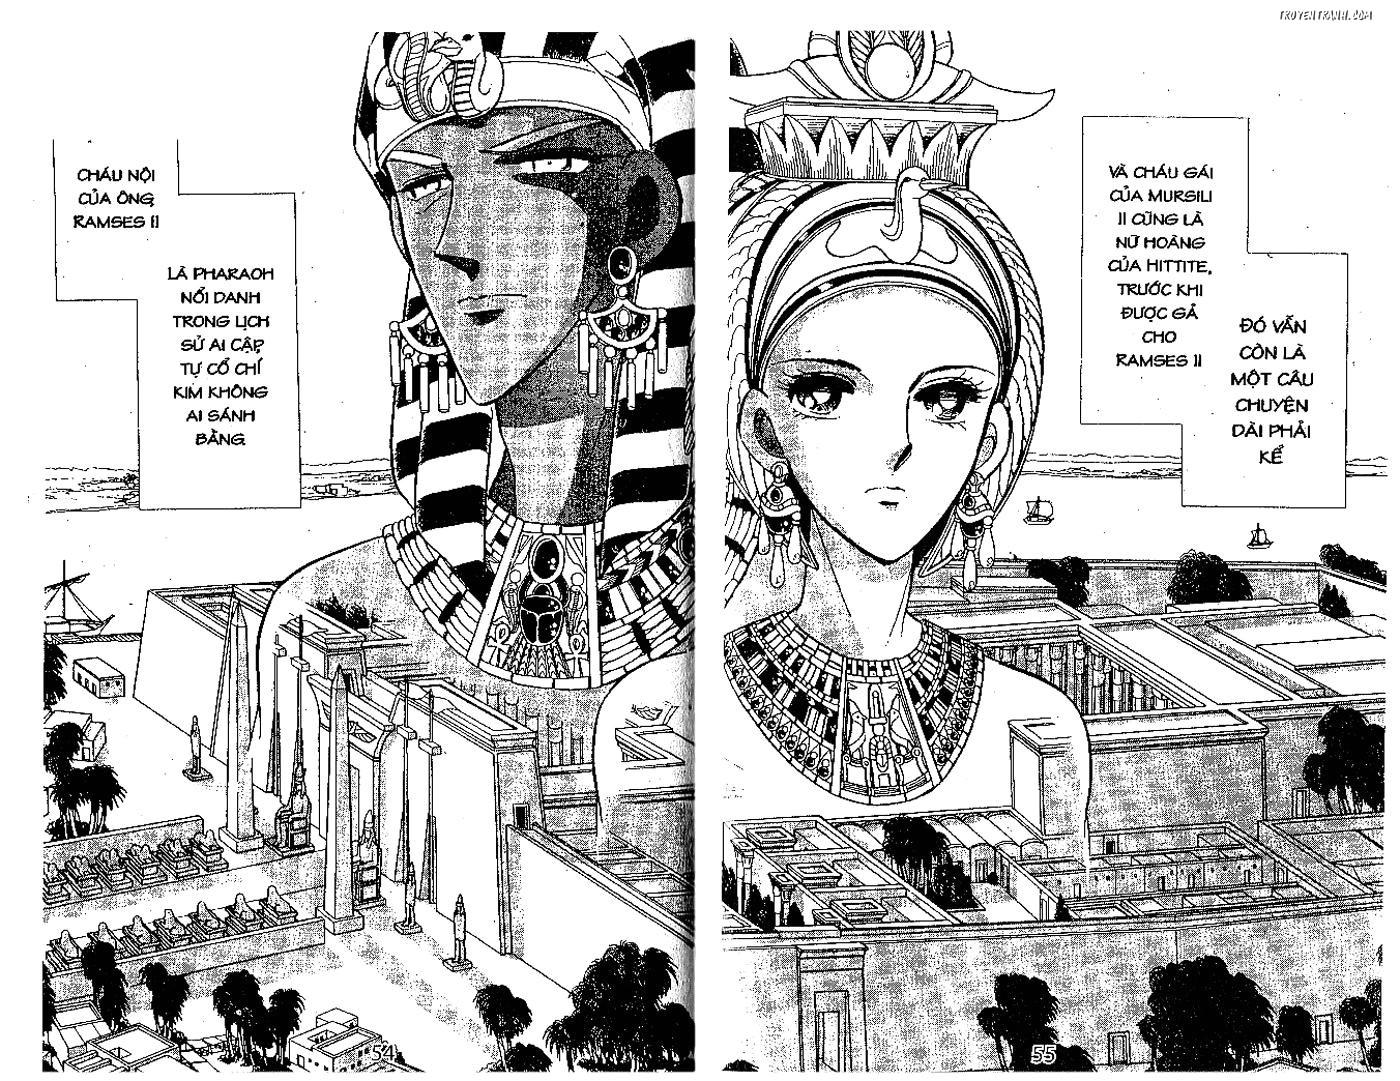 Sora wa Akai Kawa no Hotori - Dòng sông huyền bí Chapter 74 - Trang 49